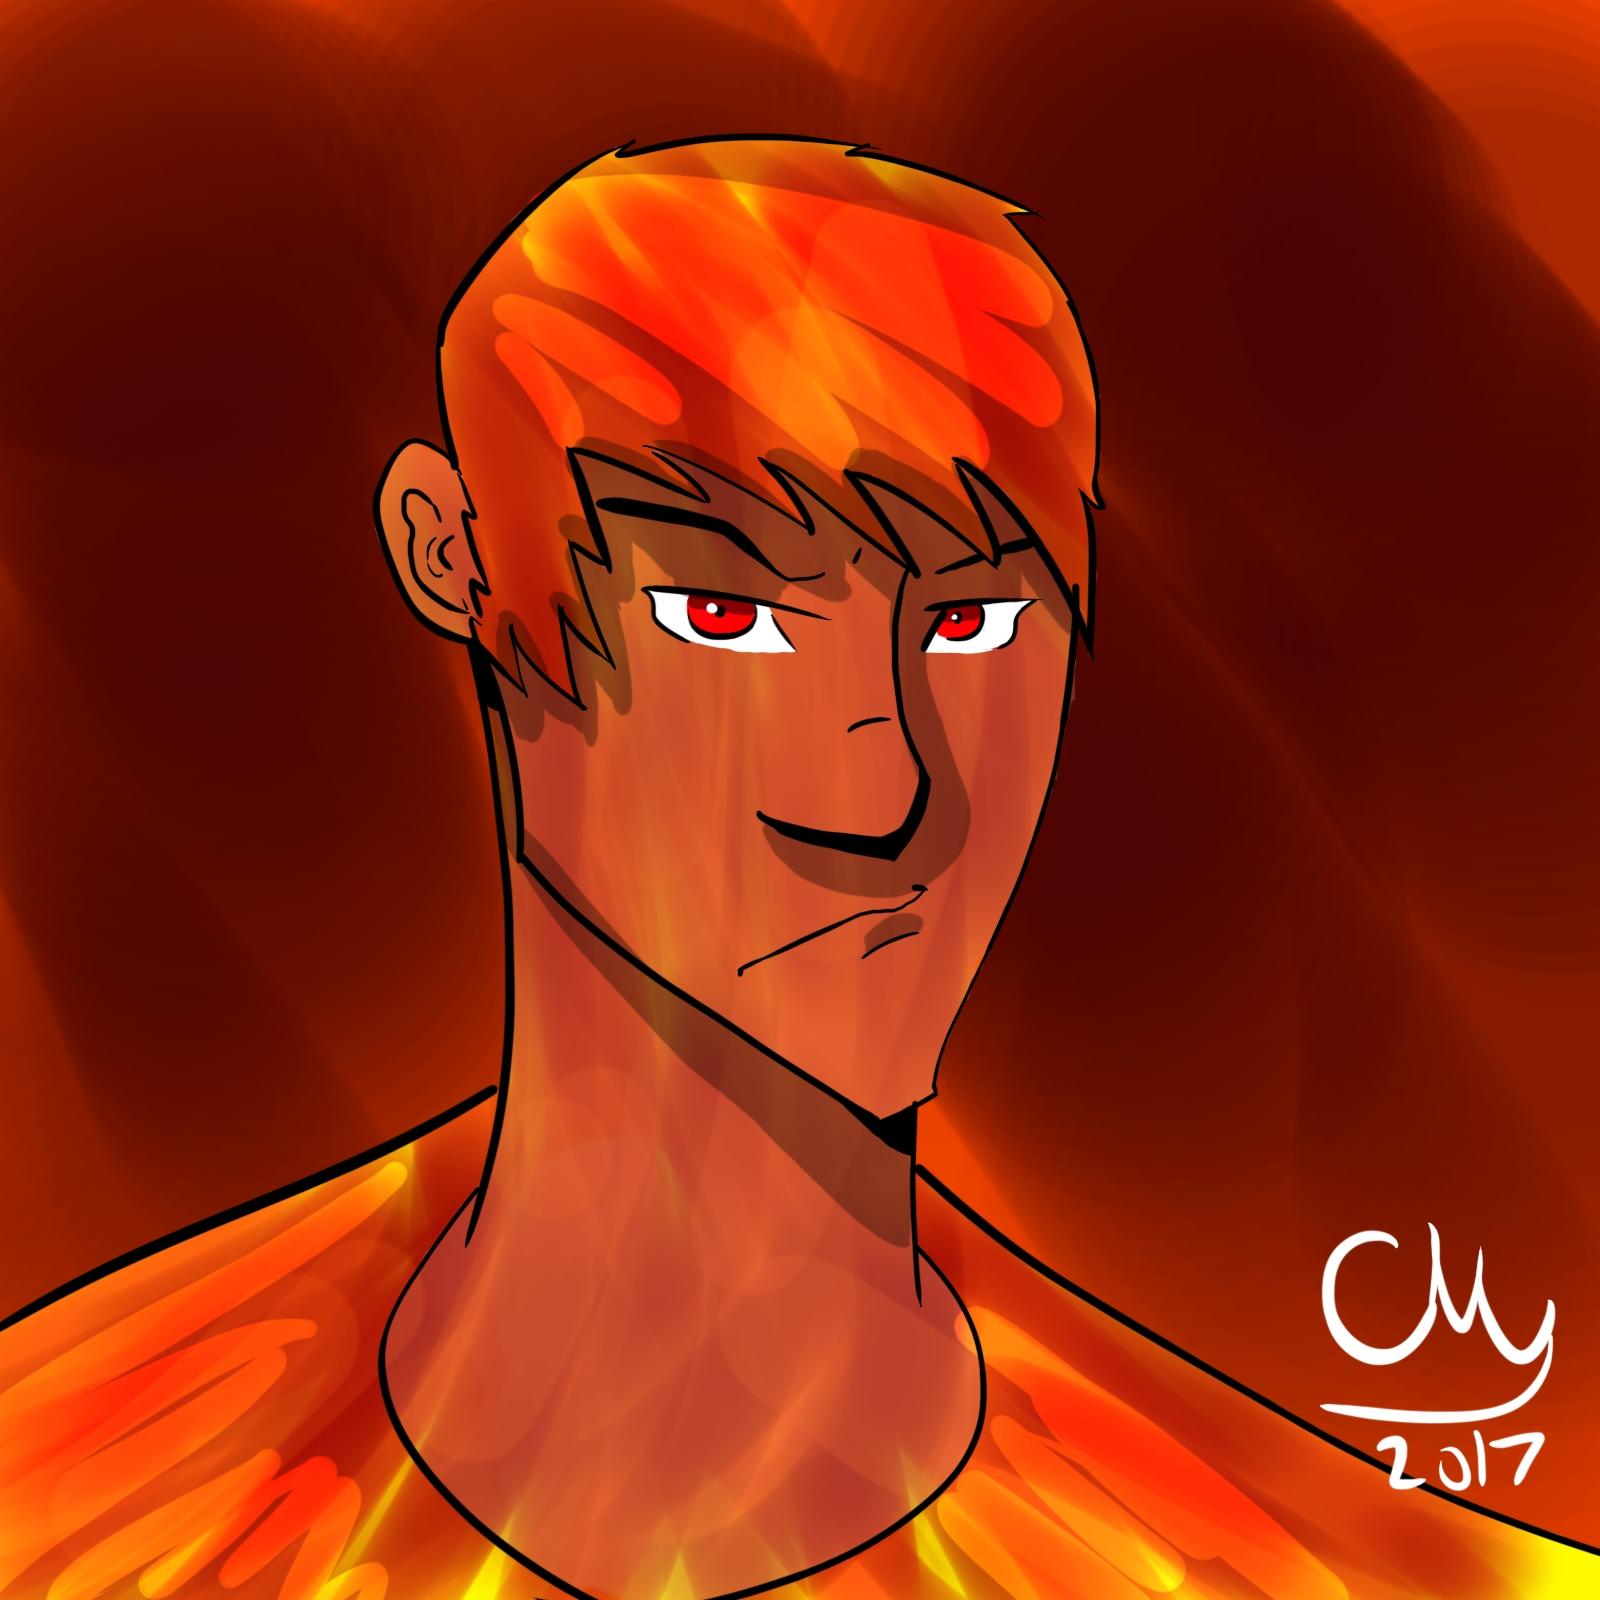 Ryan the fire guy